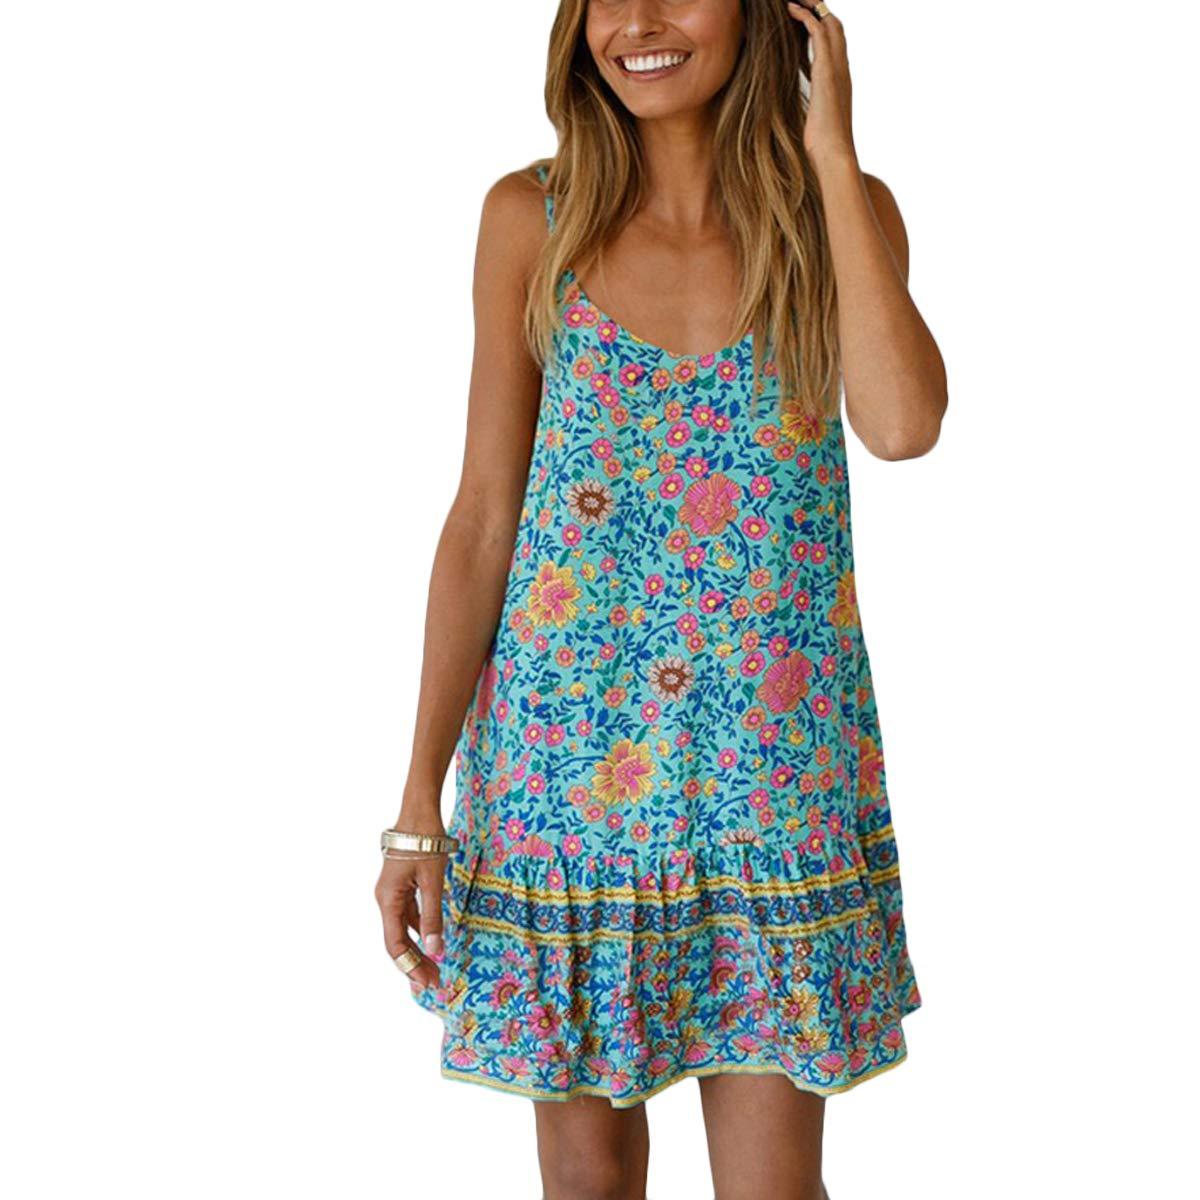 Available at Amazon: AELSON Women's Boho V Neck Dress Floral Print Spaghetti Straps Summer Beach Dress